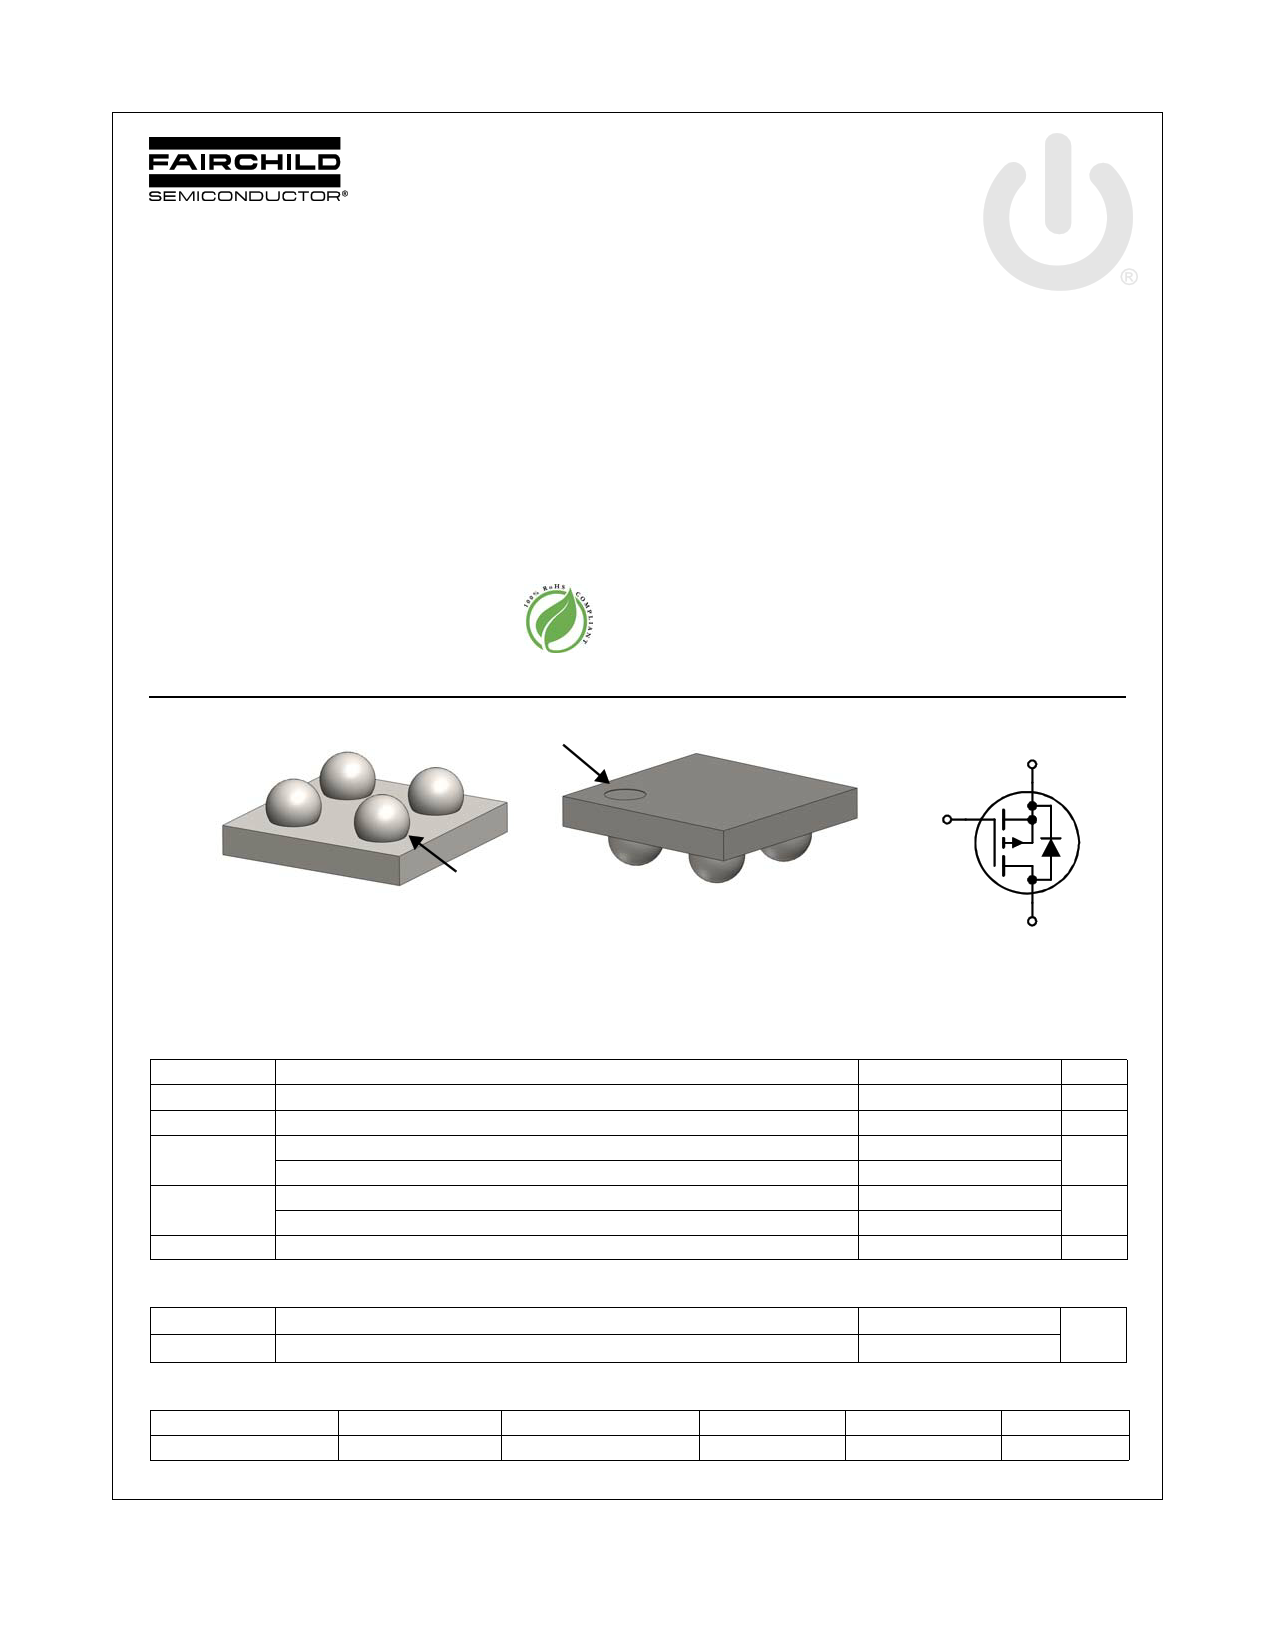 FDZ663P 데이터시트 및 FDZ663P PDF